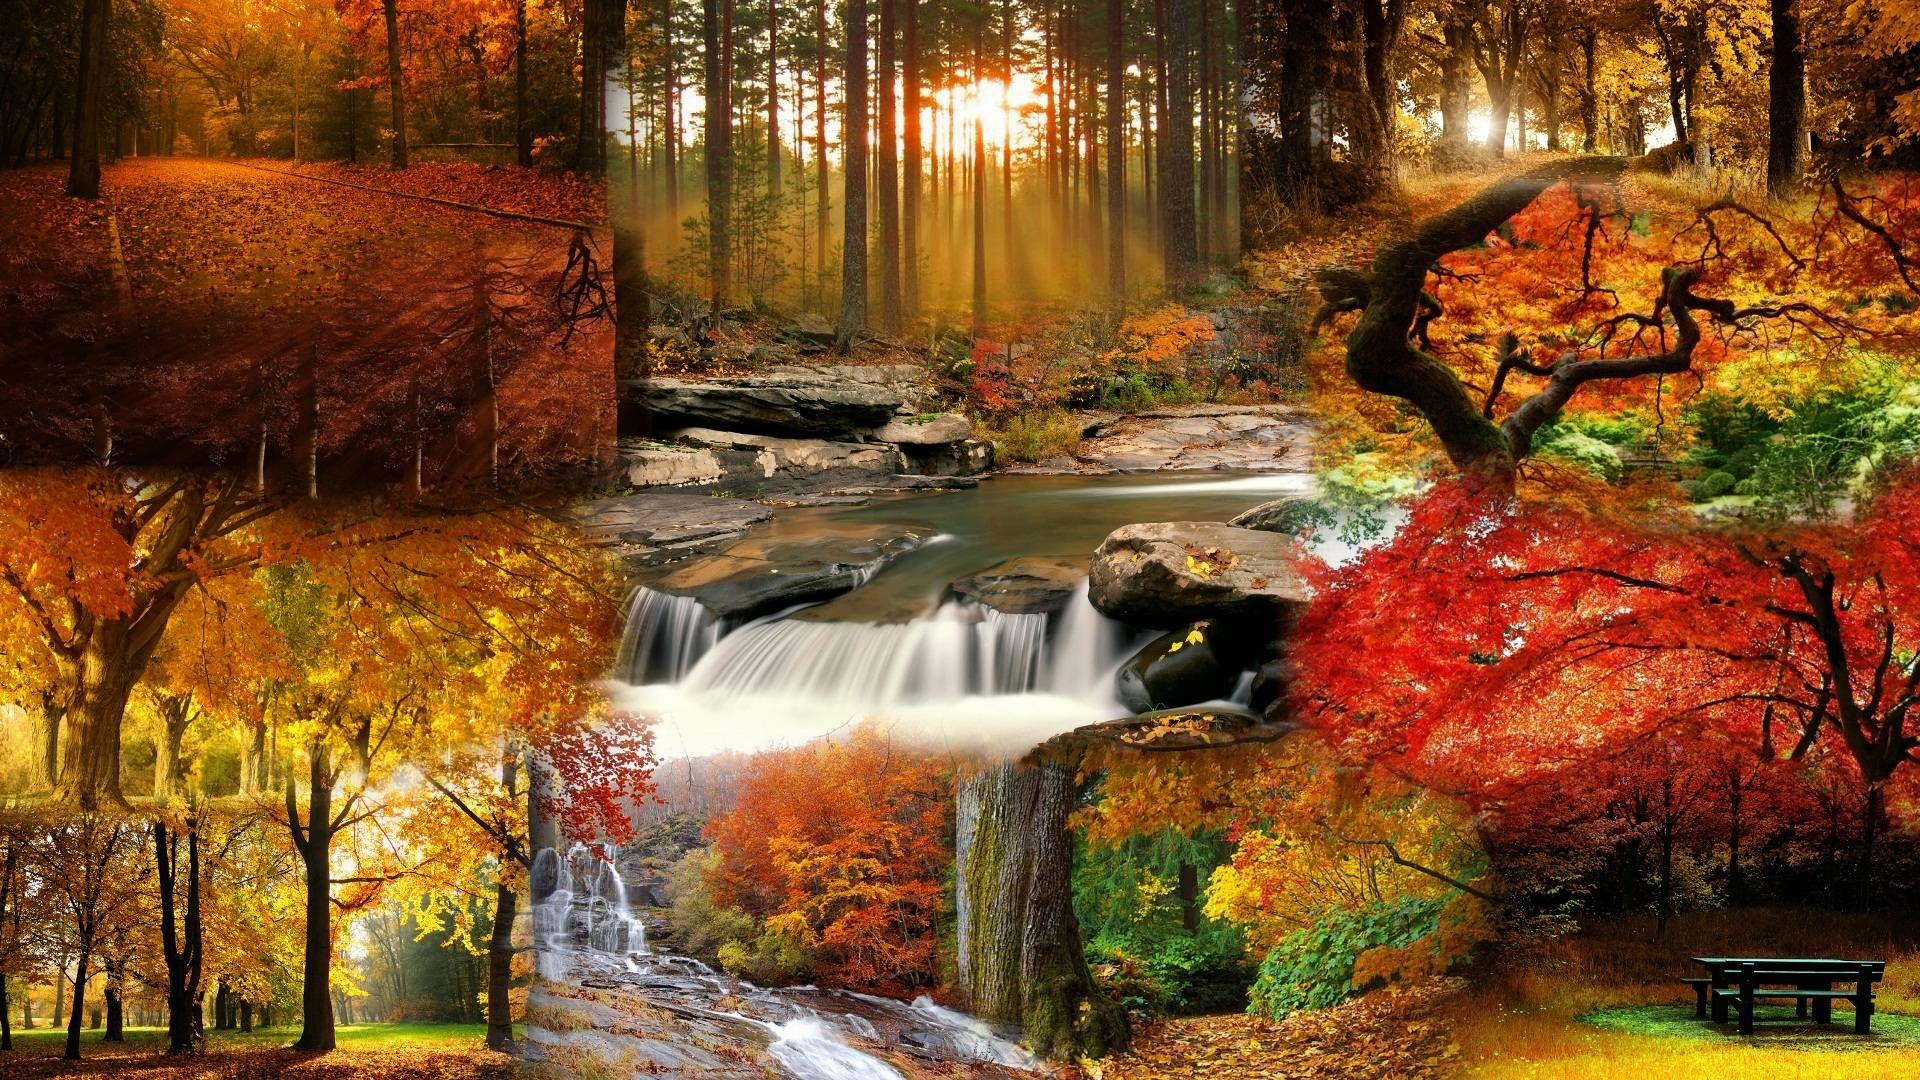 Landscape Fall Wallpaper Picture Opw Herbstbilder Herbst Bilder Bilder